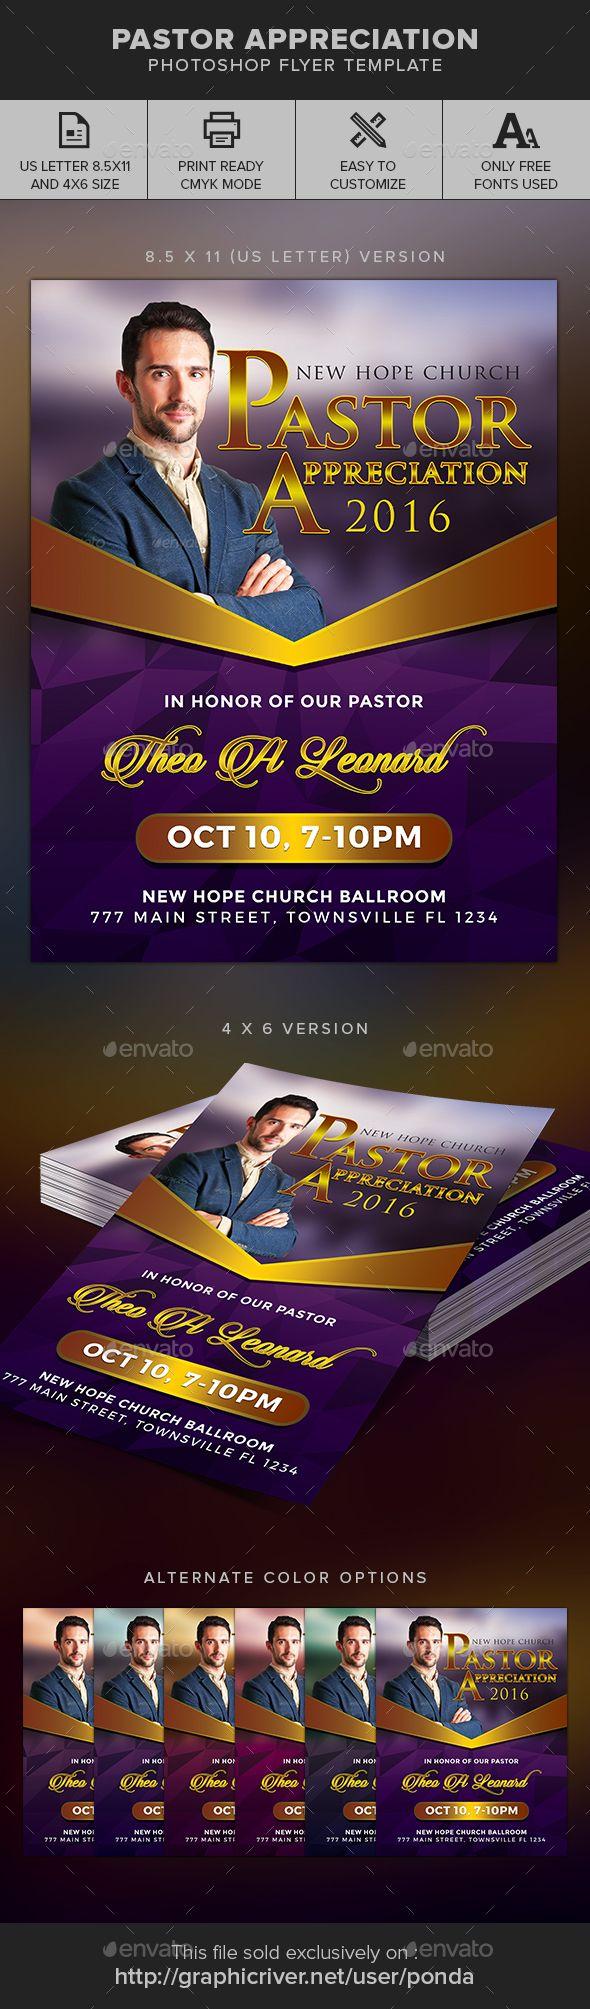 Pastor Appreciation Flyer Template Flyer Template